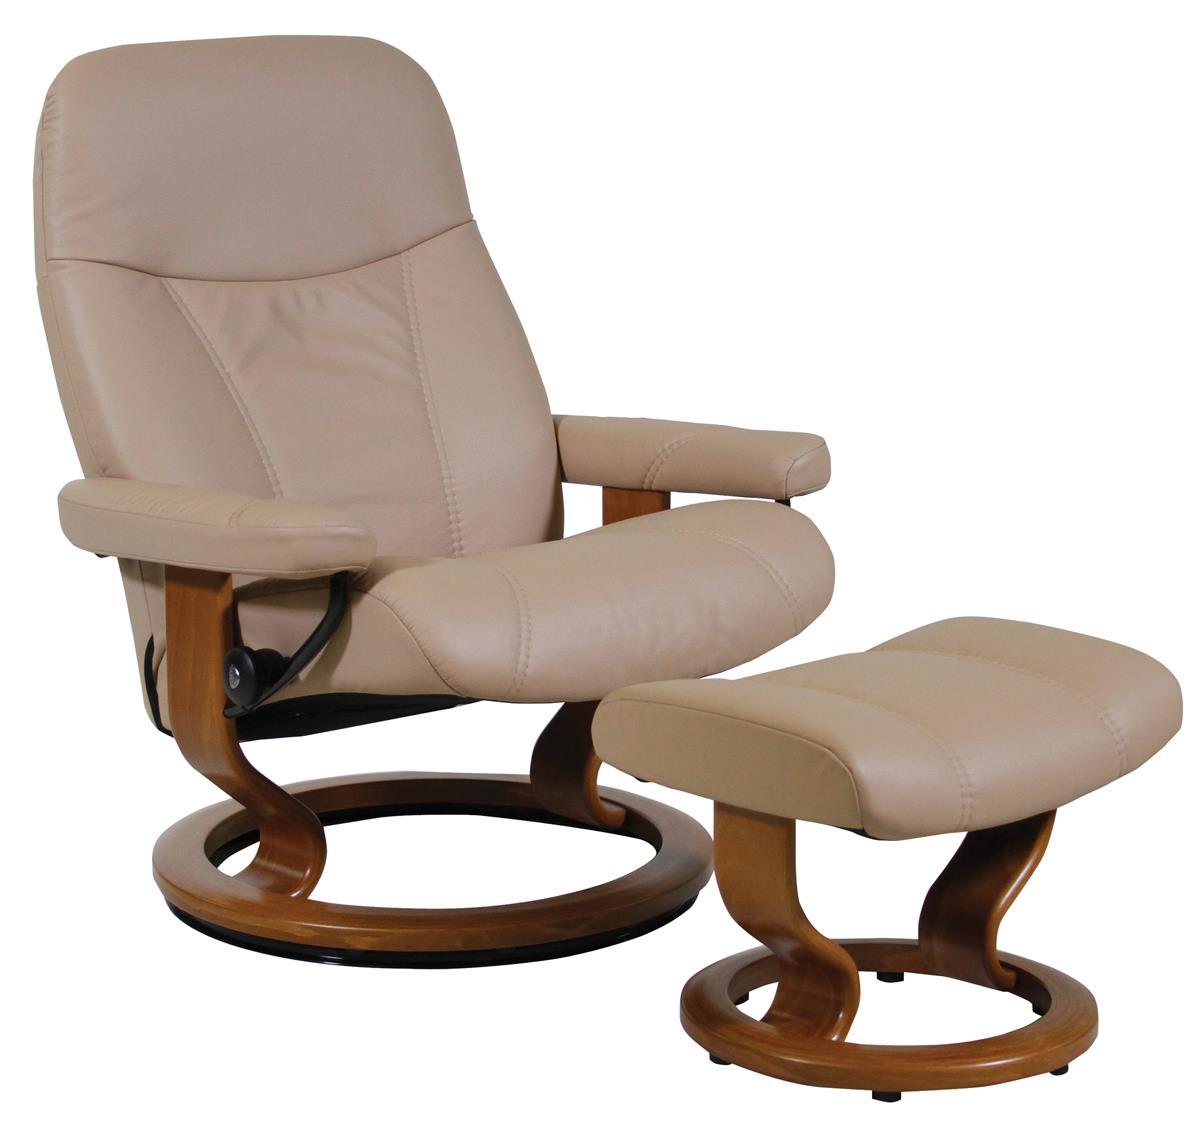 Stressless By Ekornes Consul Large Stressless Chair U0026 Ottoman   HomeWorld  Furniture   Reclining Chair U0026 Ottoman Sets